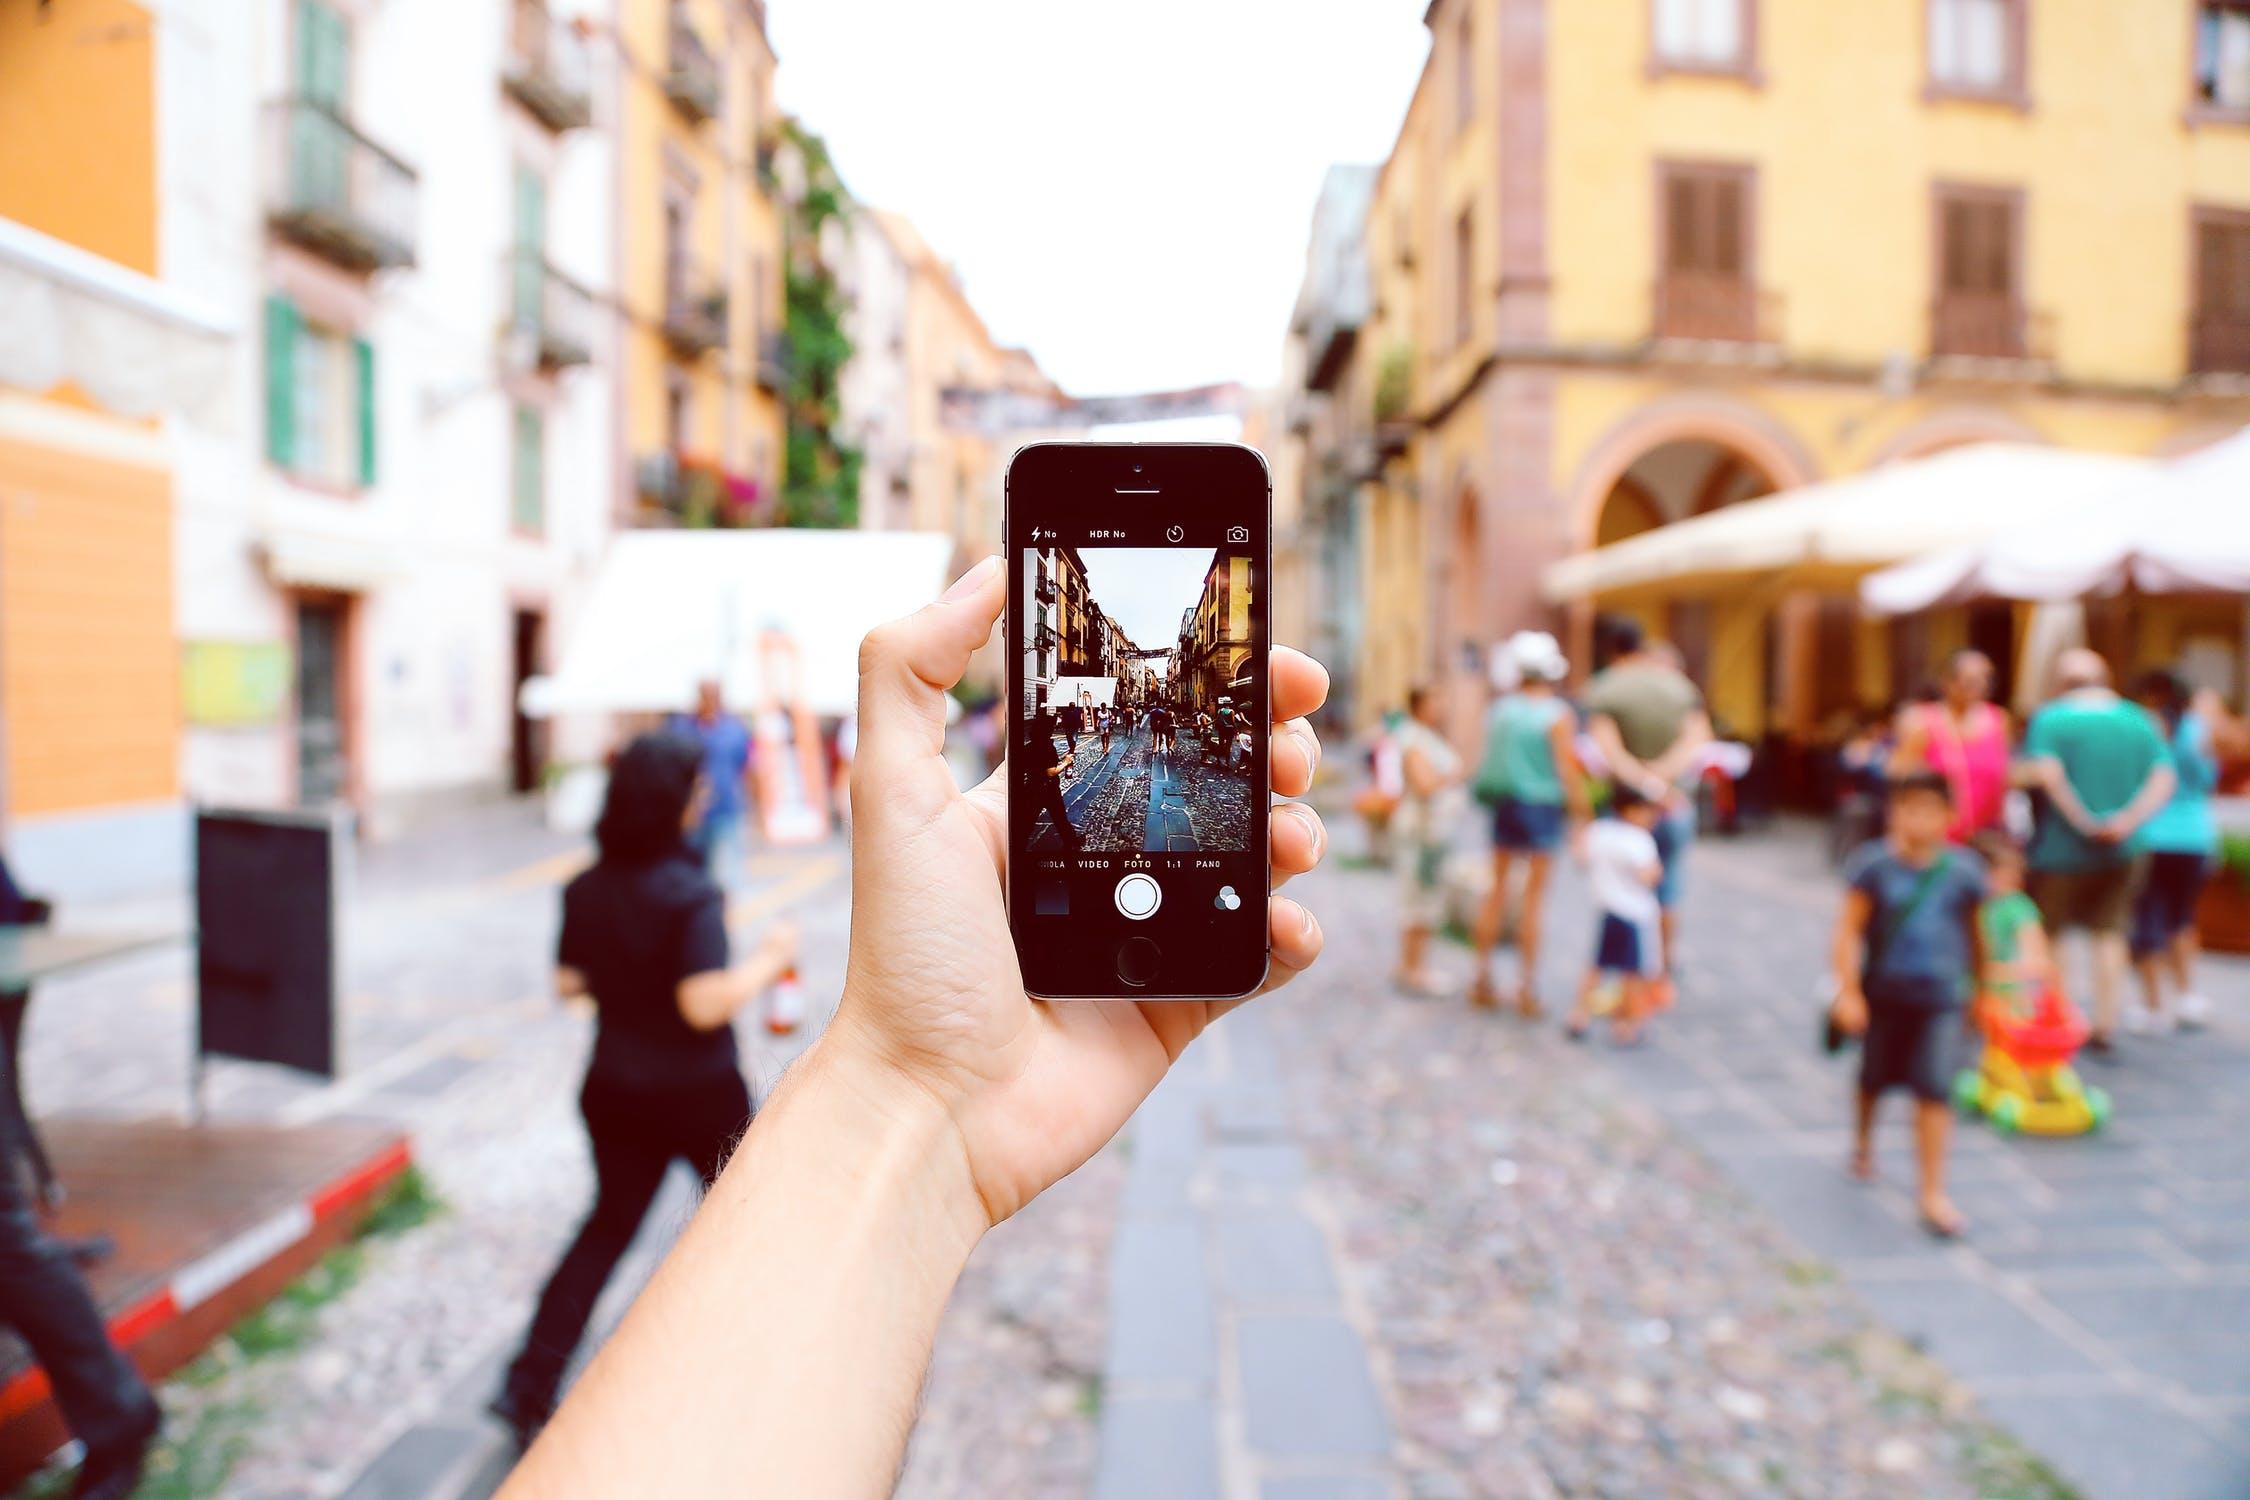 mobile phone camera